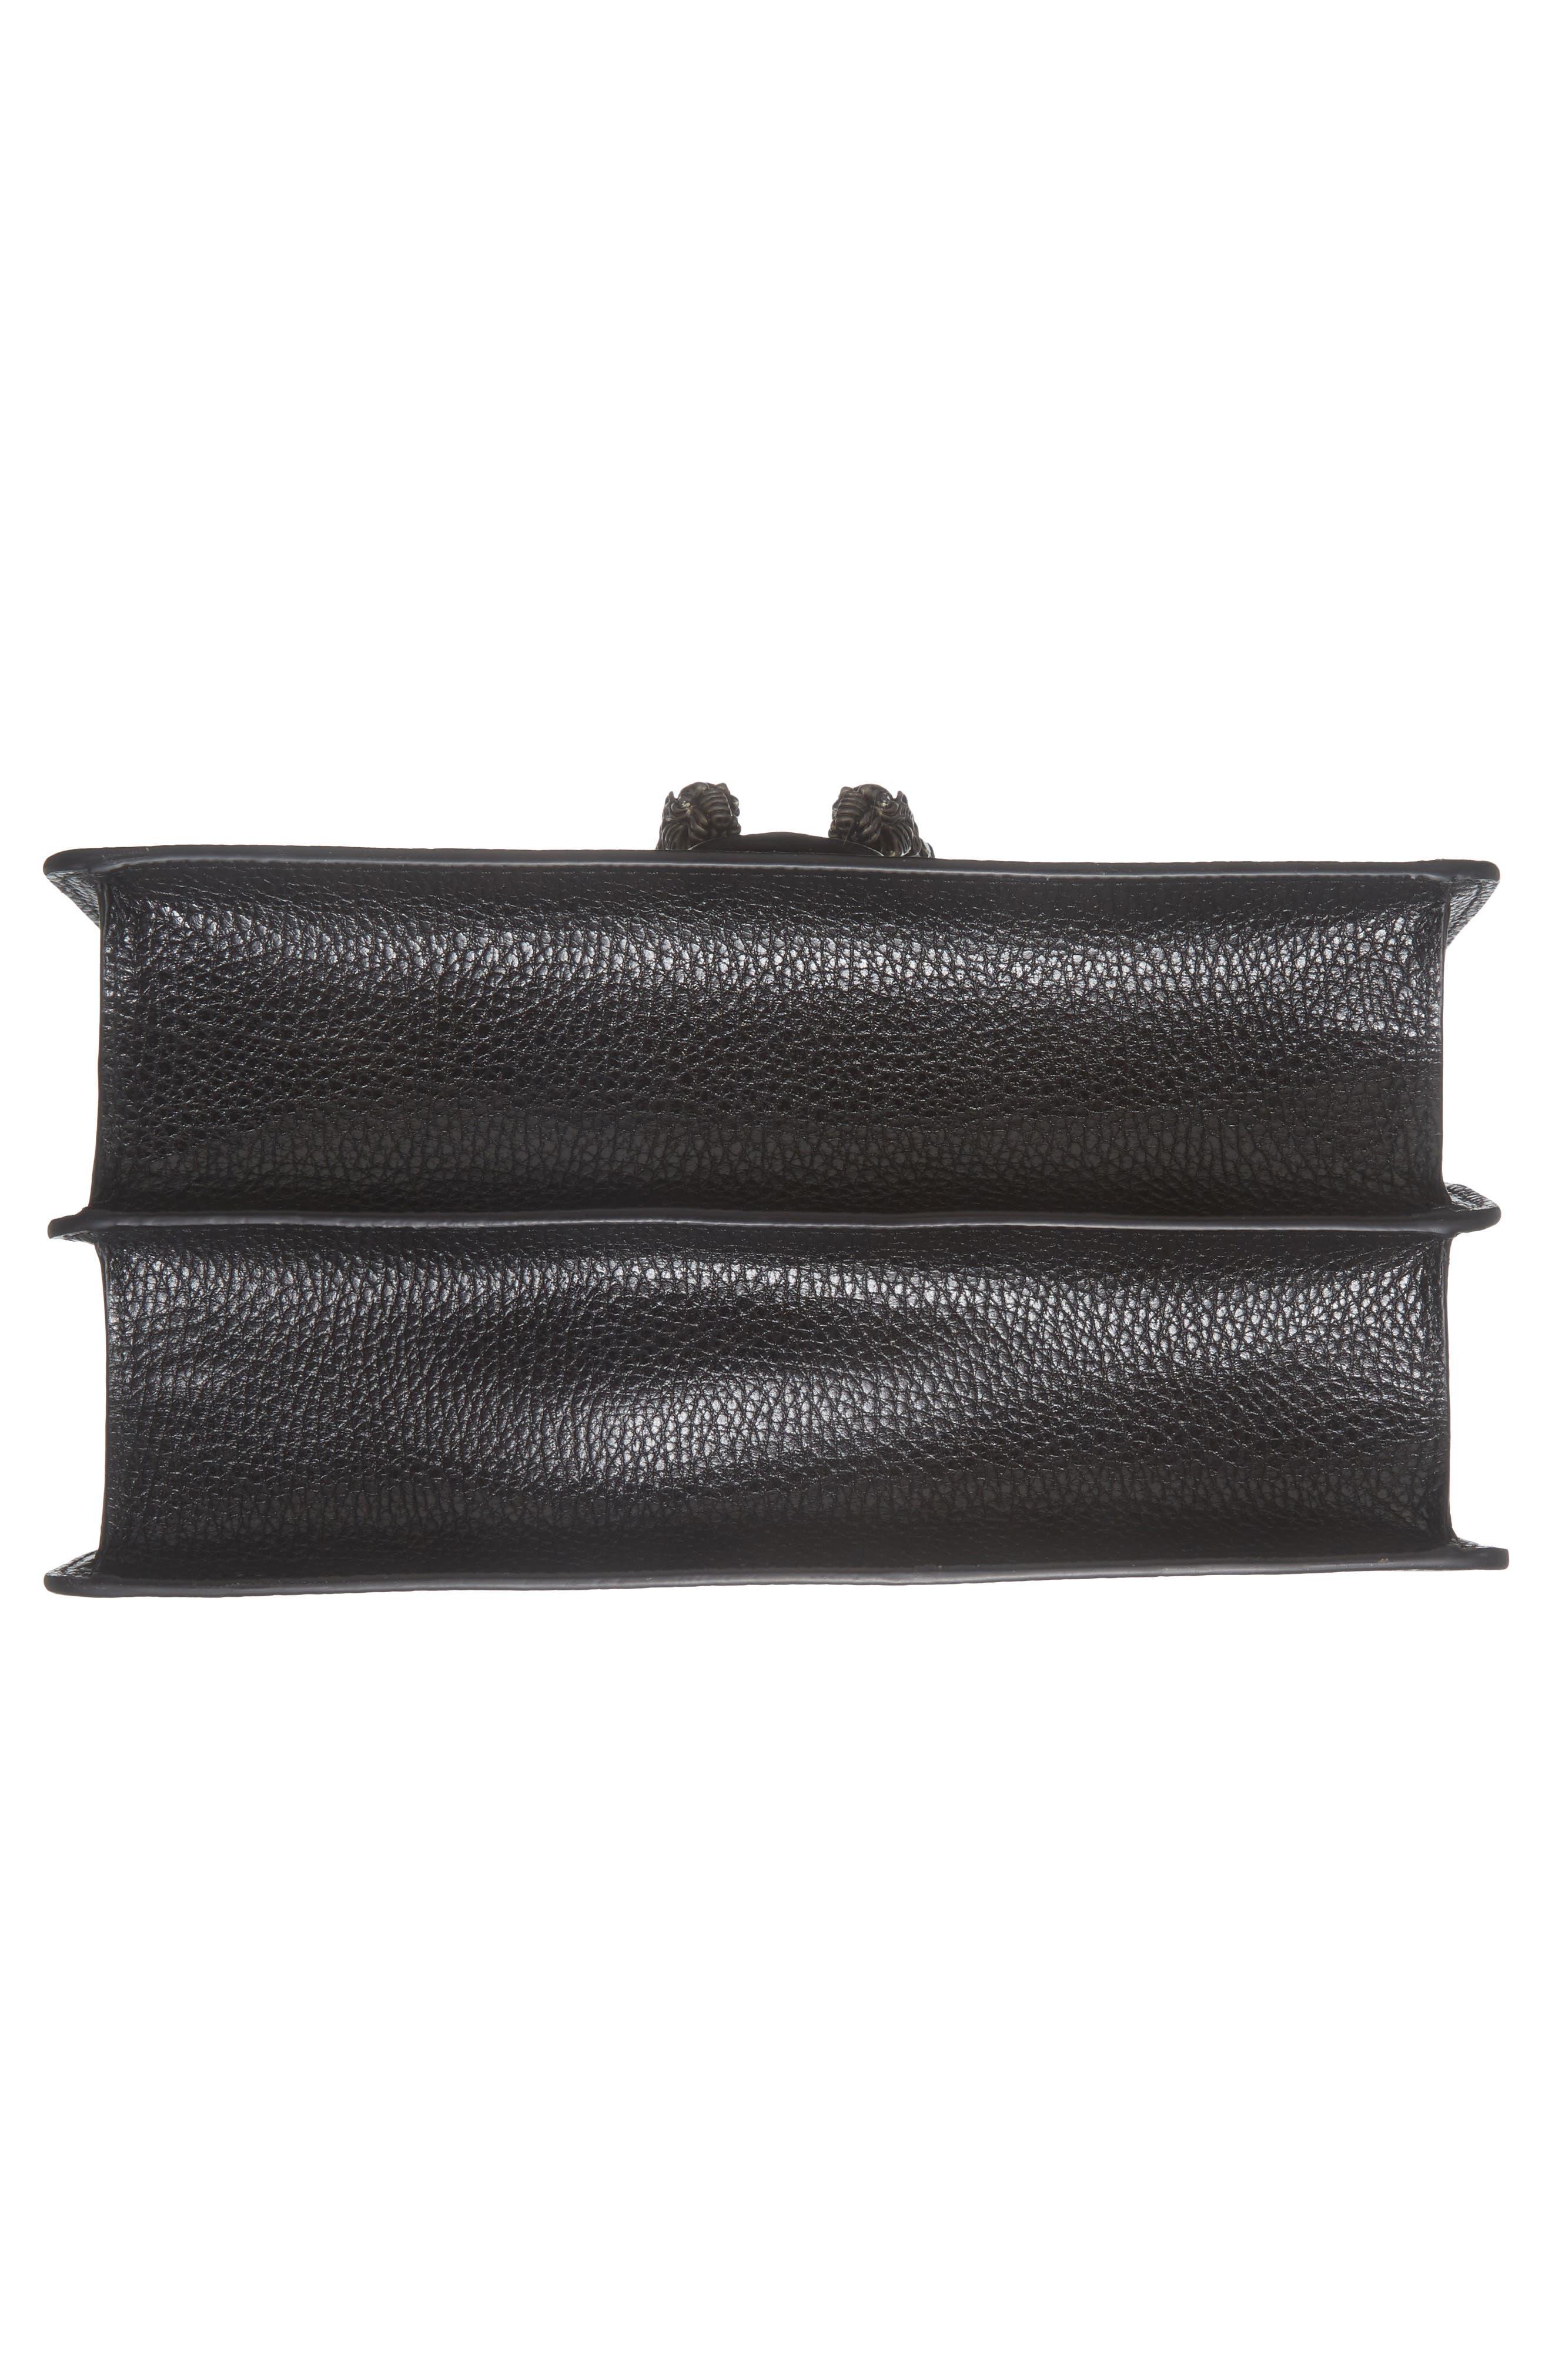 Medium Dionysus Leather Top Handle Satchel,                             Alternate thumbnail 6, color,                             Nero/ Vrv/ Black Diamond